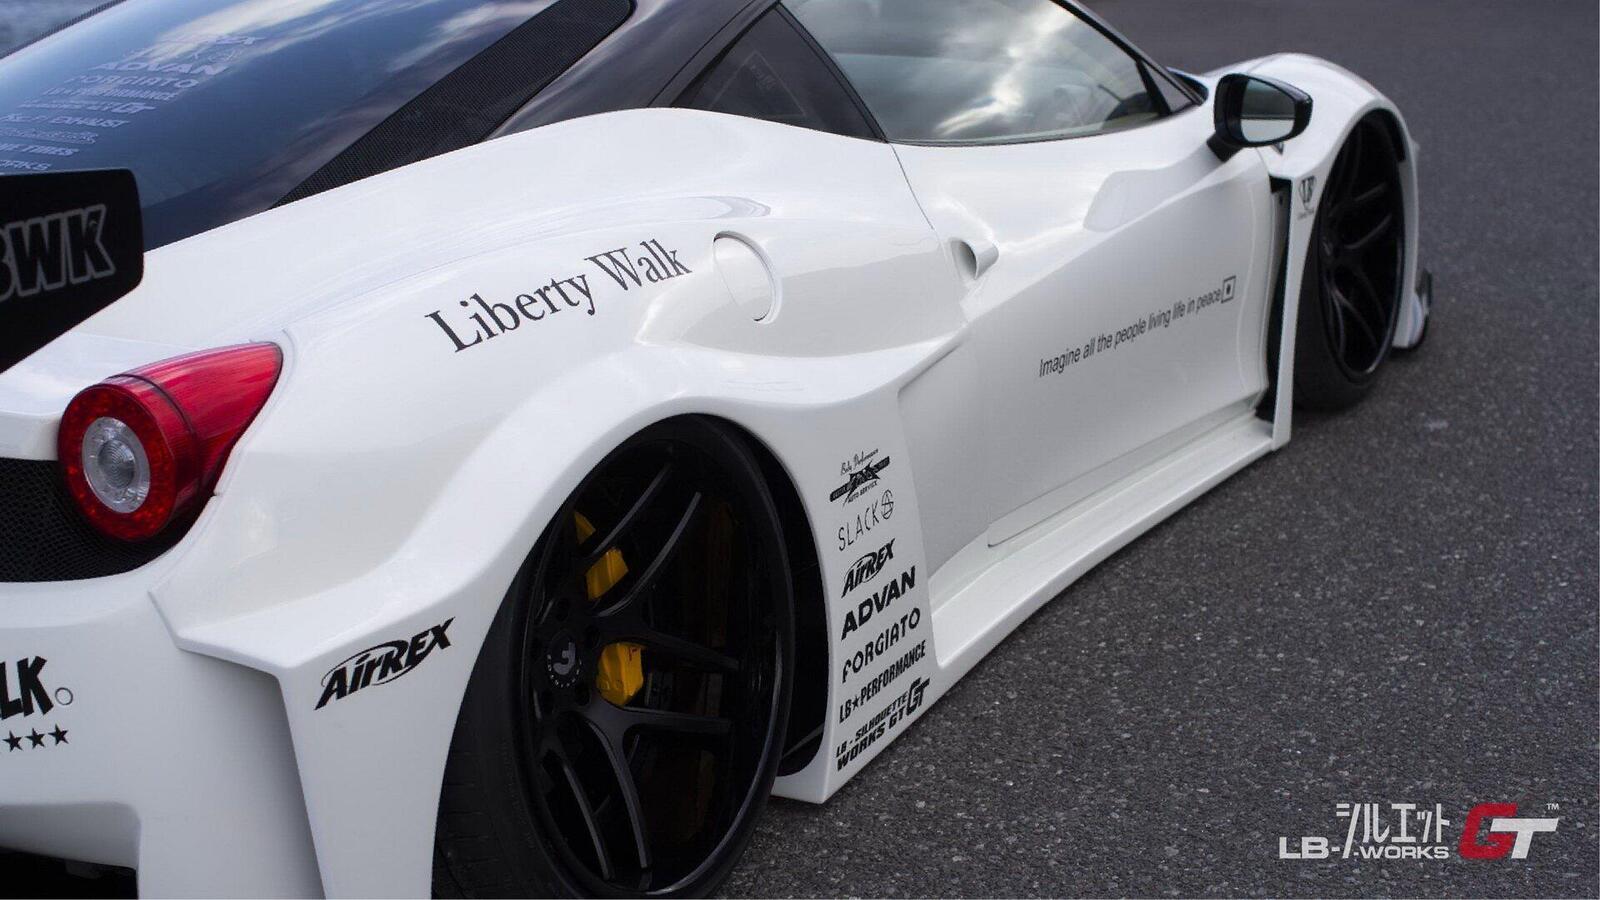 liberty-walk-ra-mat-bo-kit-wide-body-moi-cho-ferrari-458-italia-3.jpeg